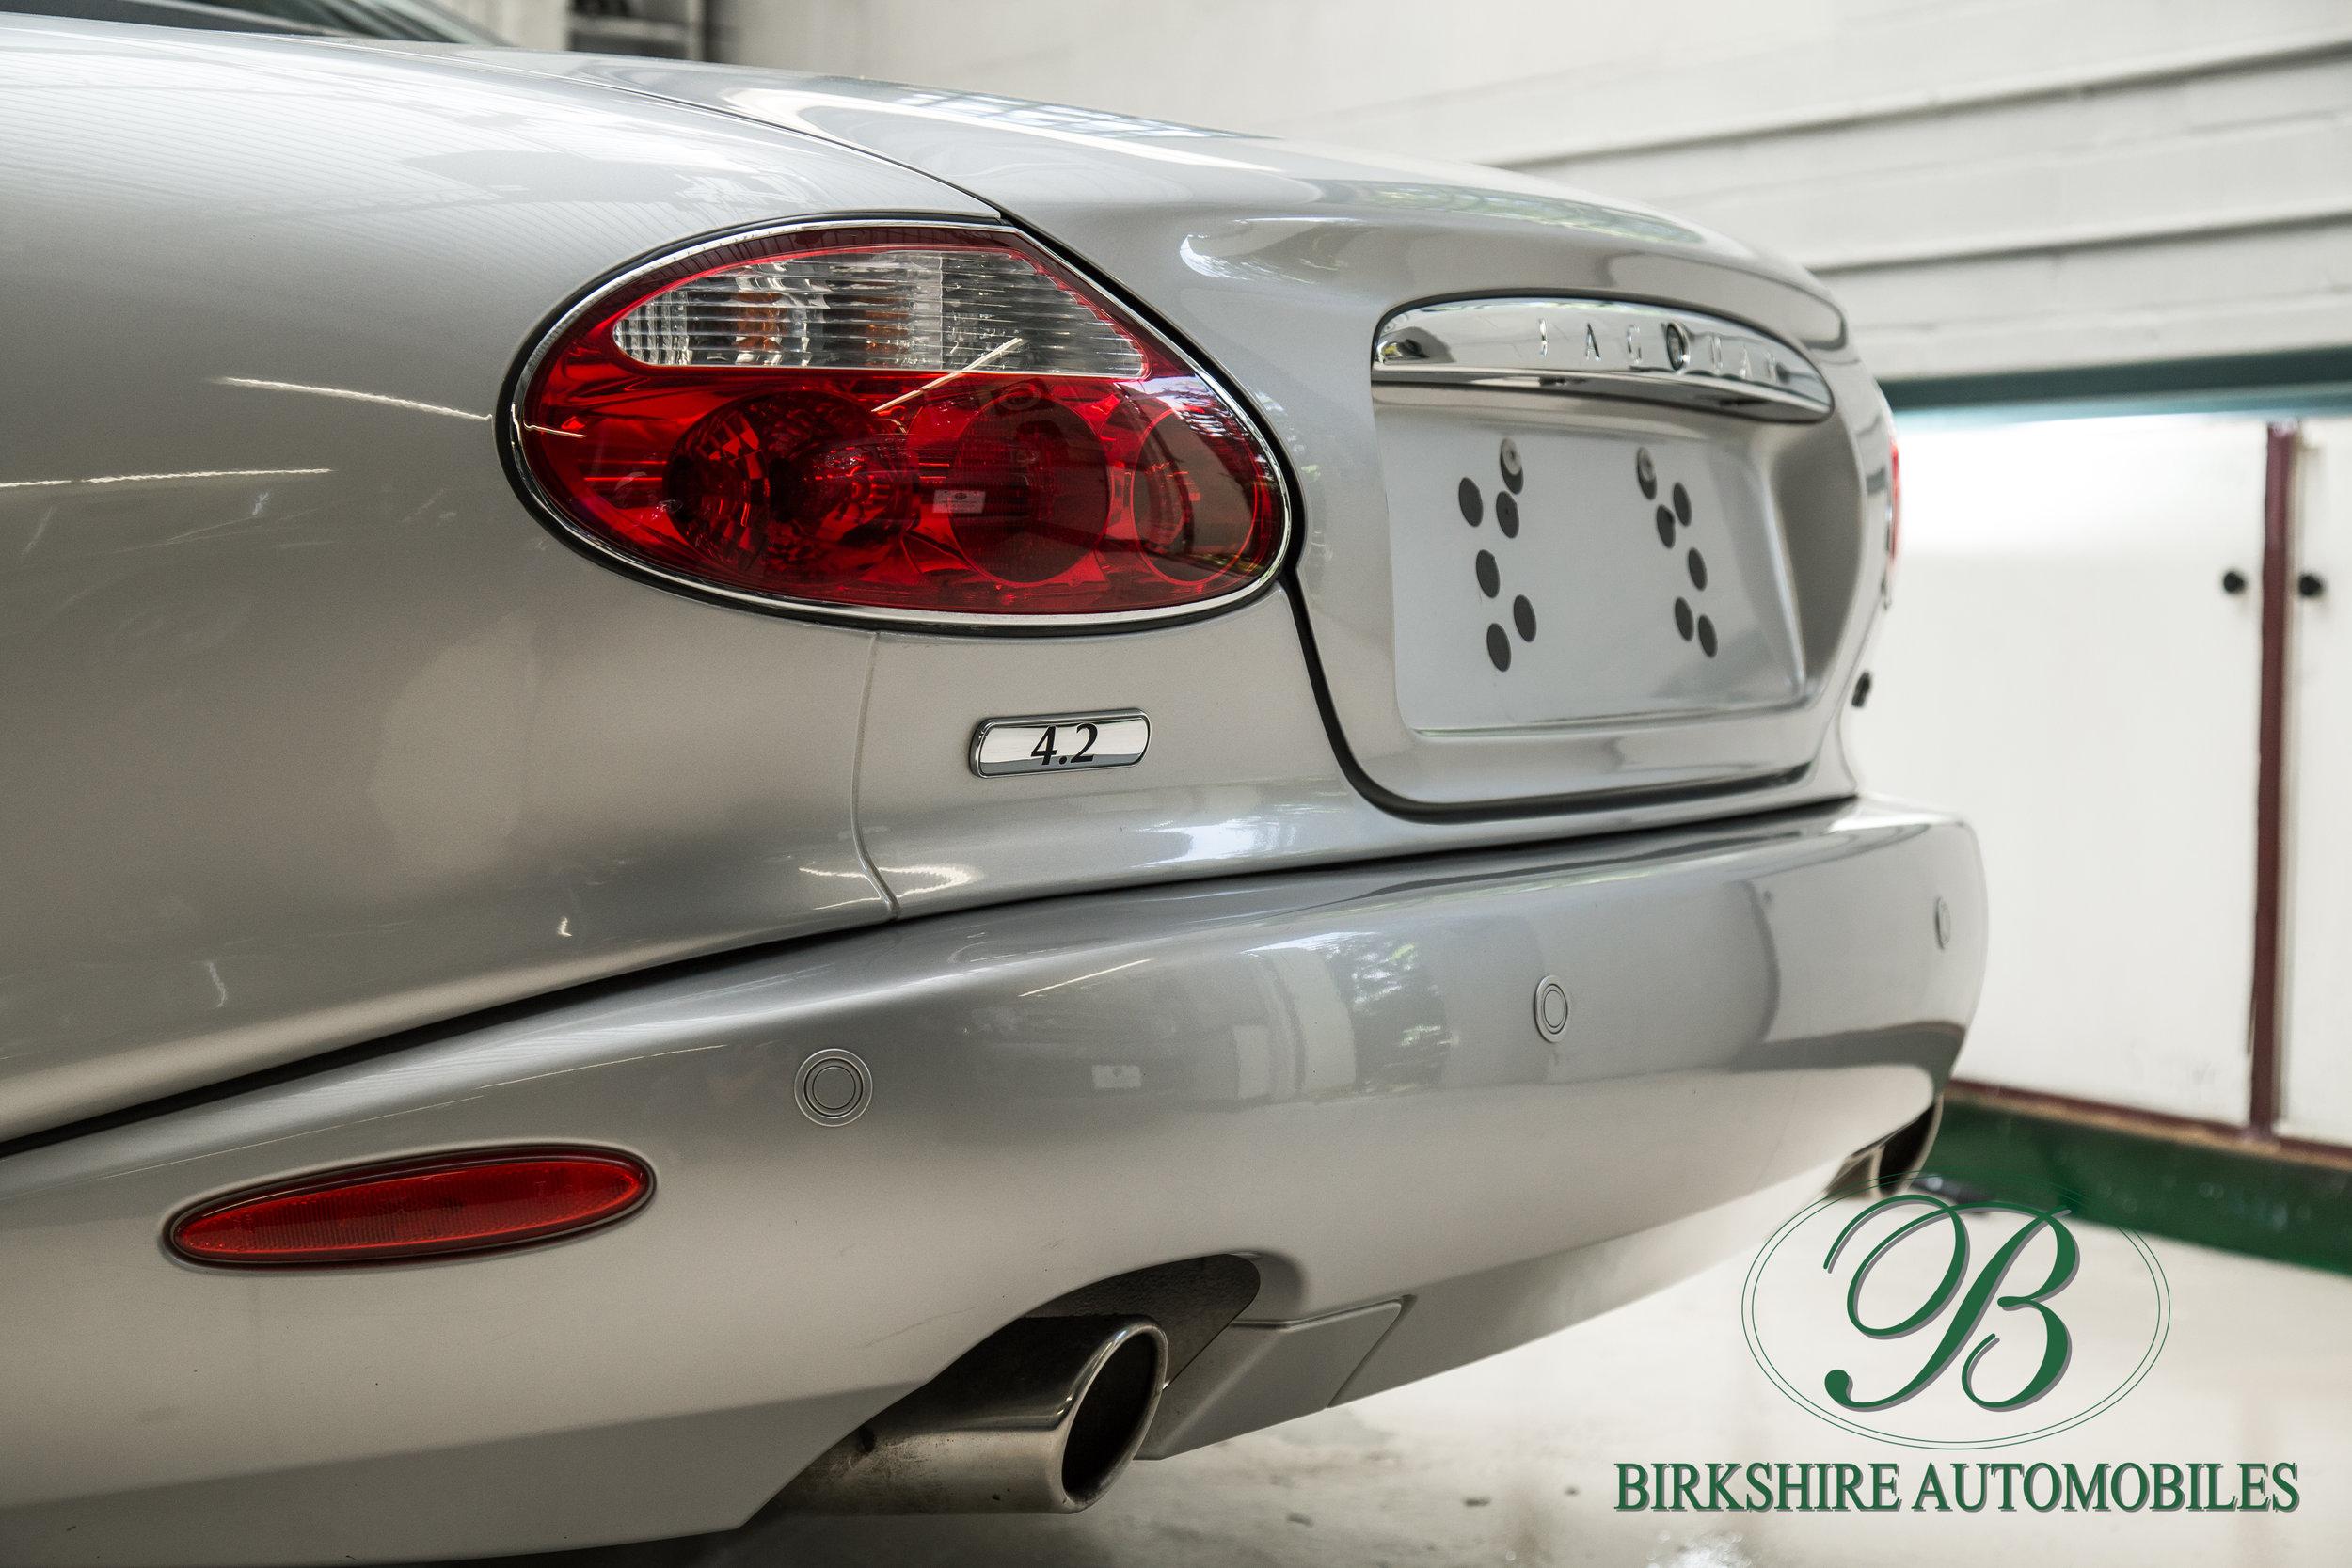 Birkshire Automobiles-222.jpg